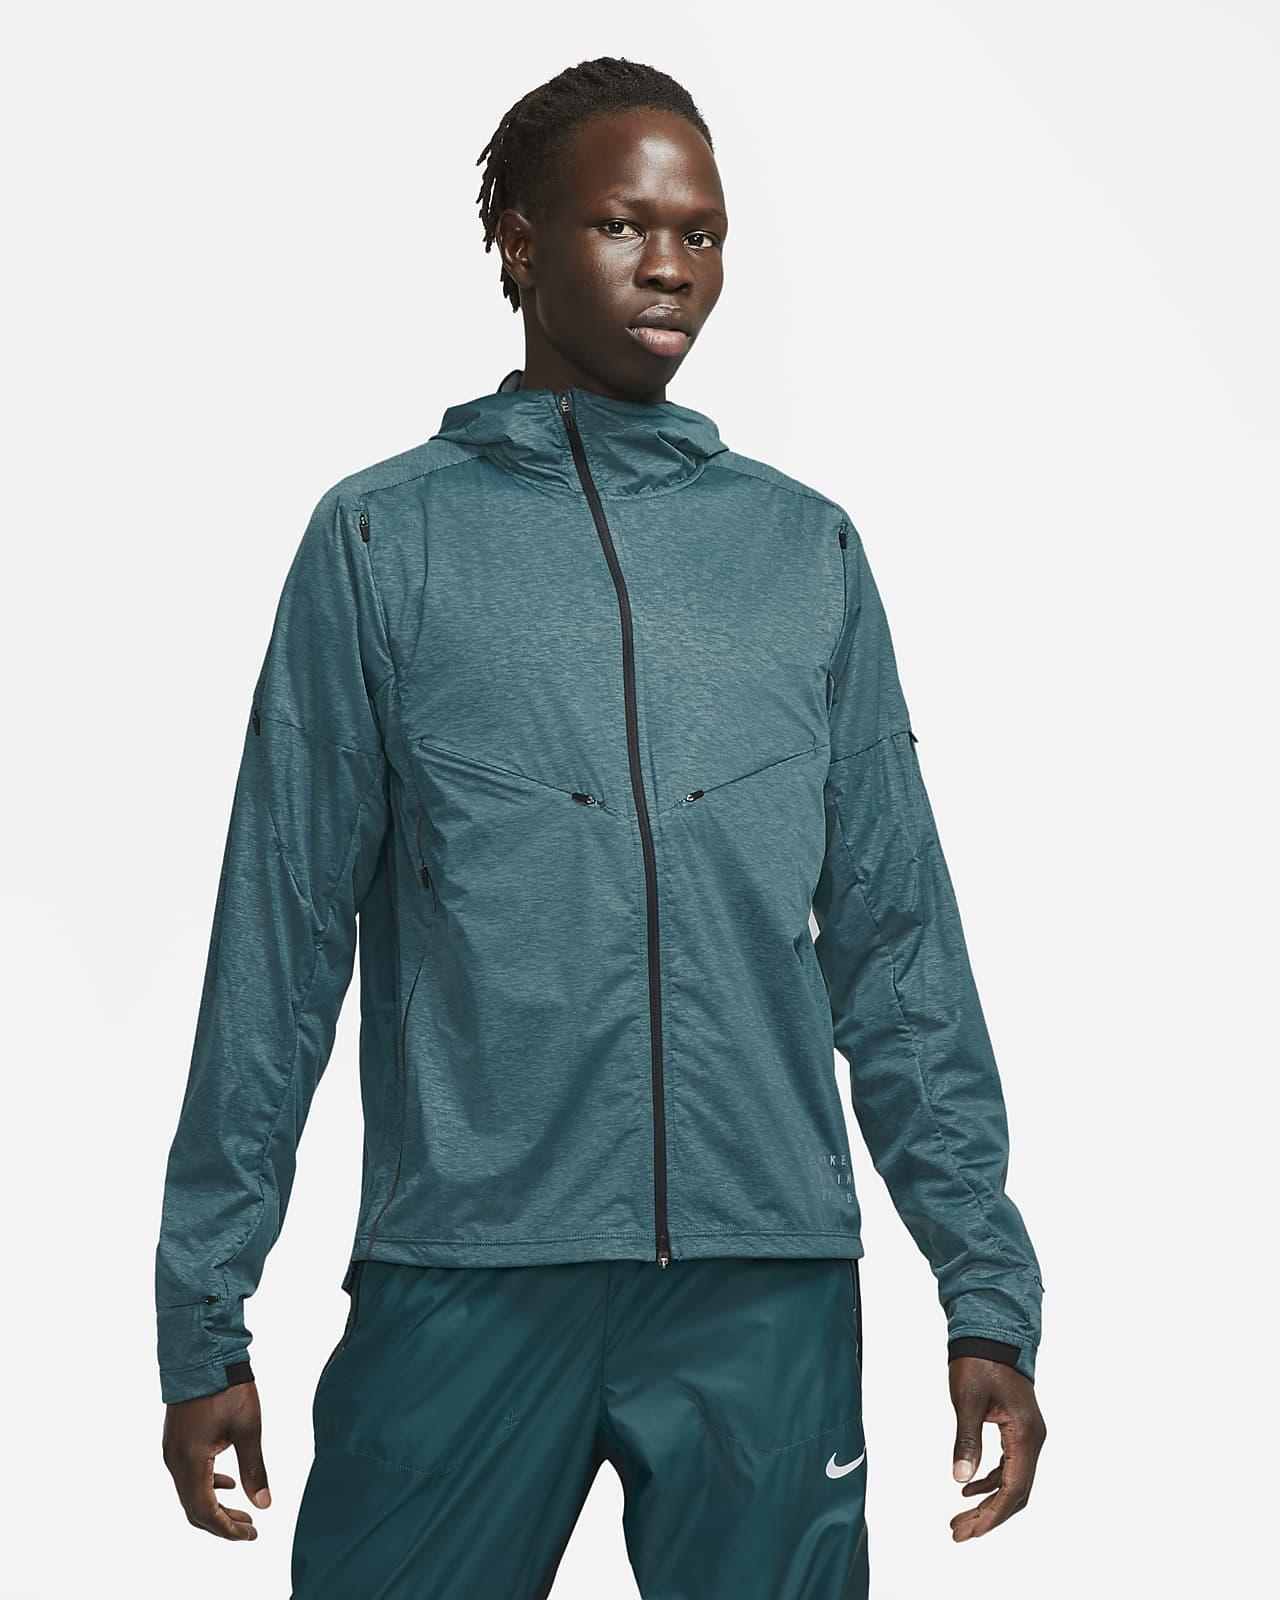 Chamarra de running estampada para hombre Nike Pinnacle Run Division